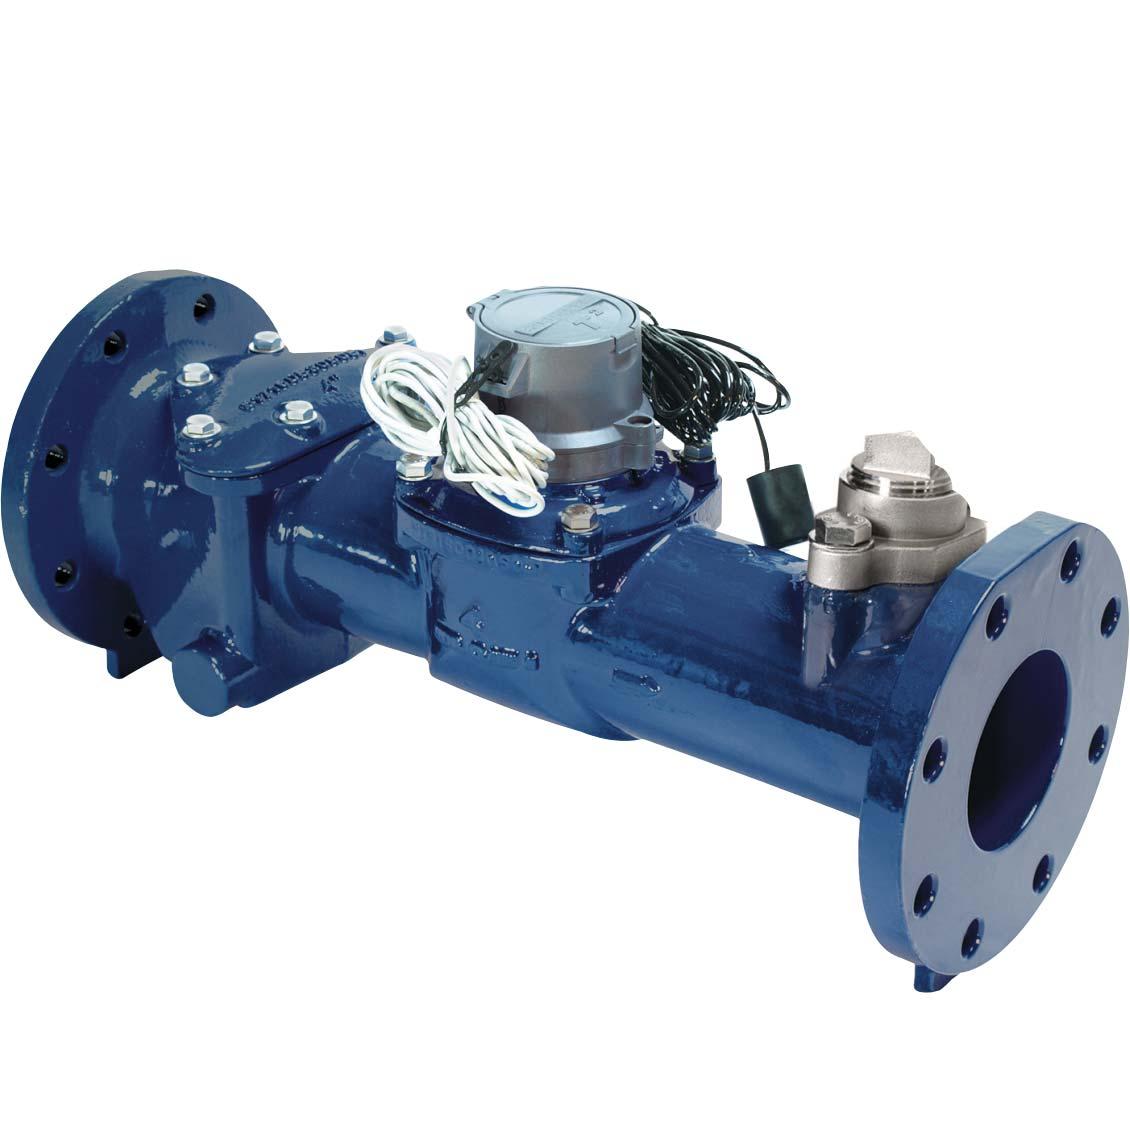 OMNI Turbo (T2) water meter